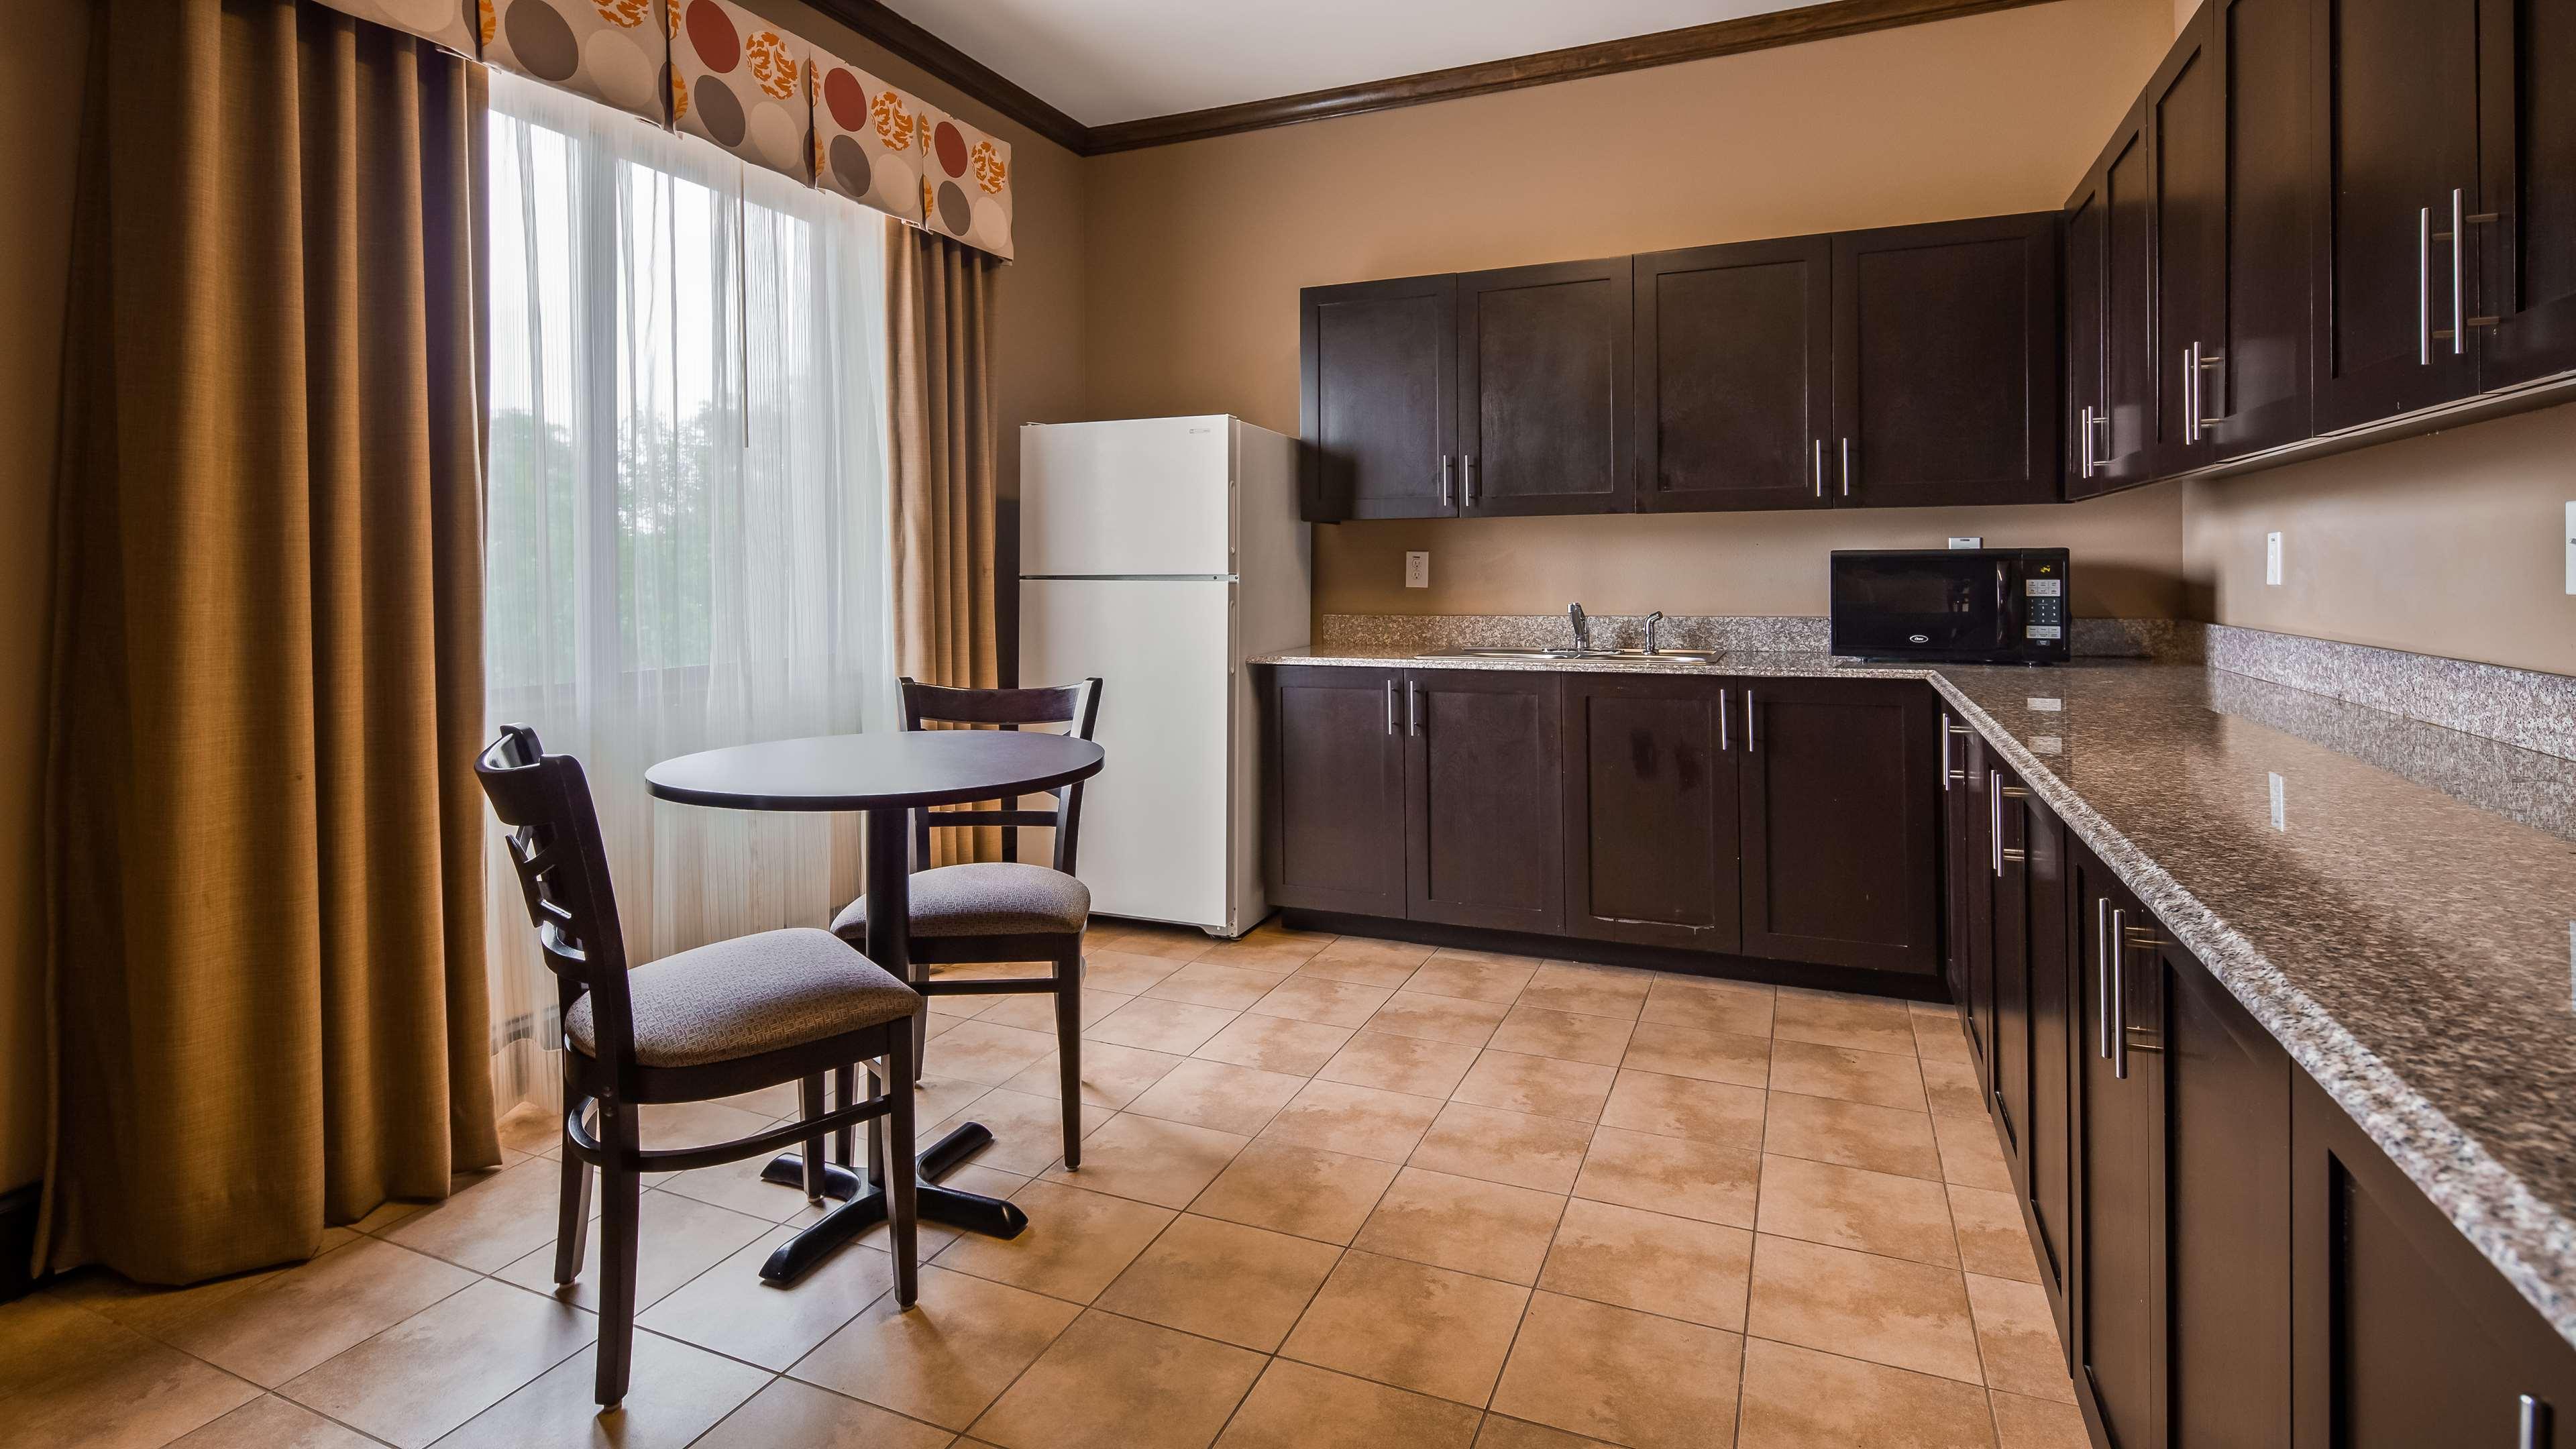 Best Western Plus Texoma Hotel & Suites image 28